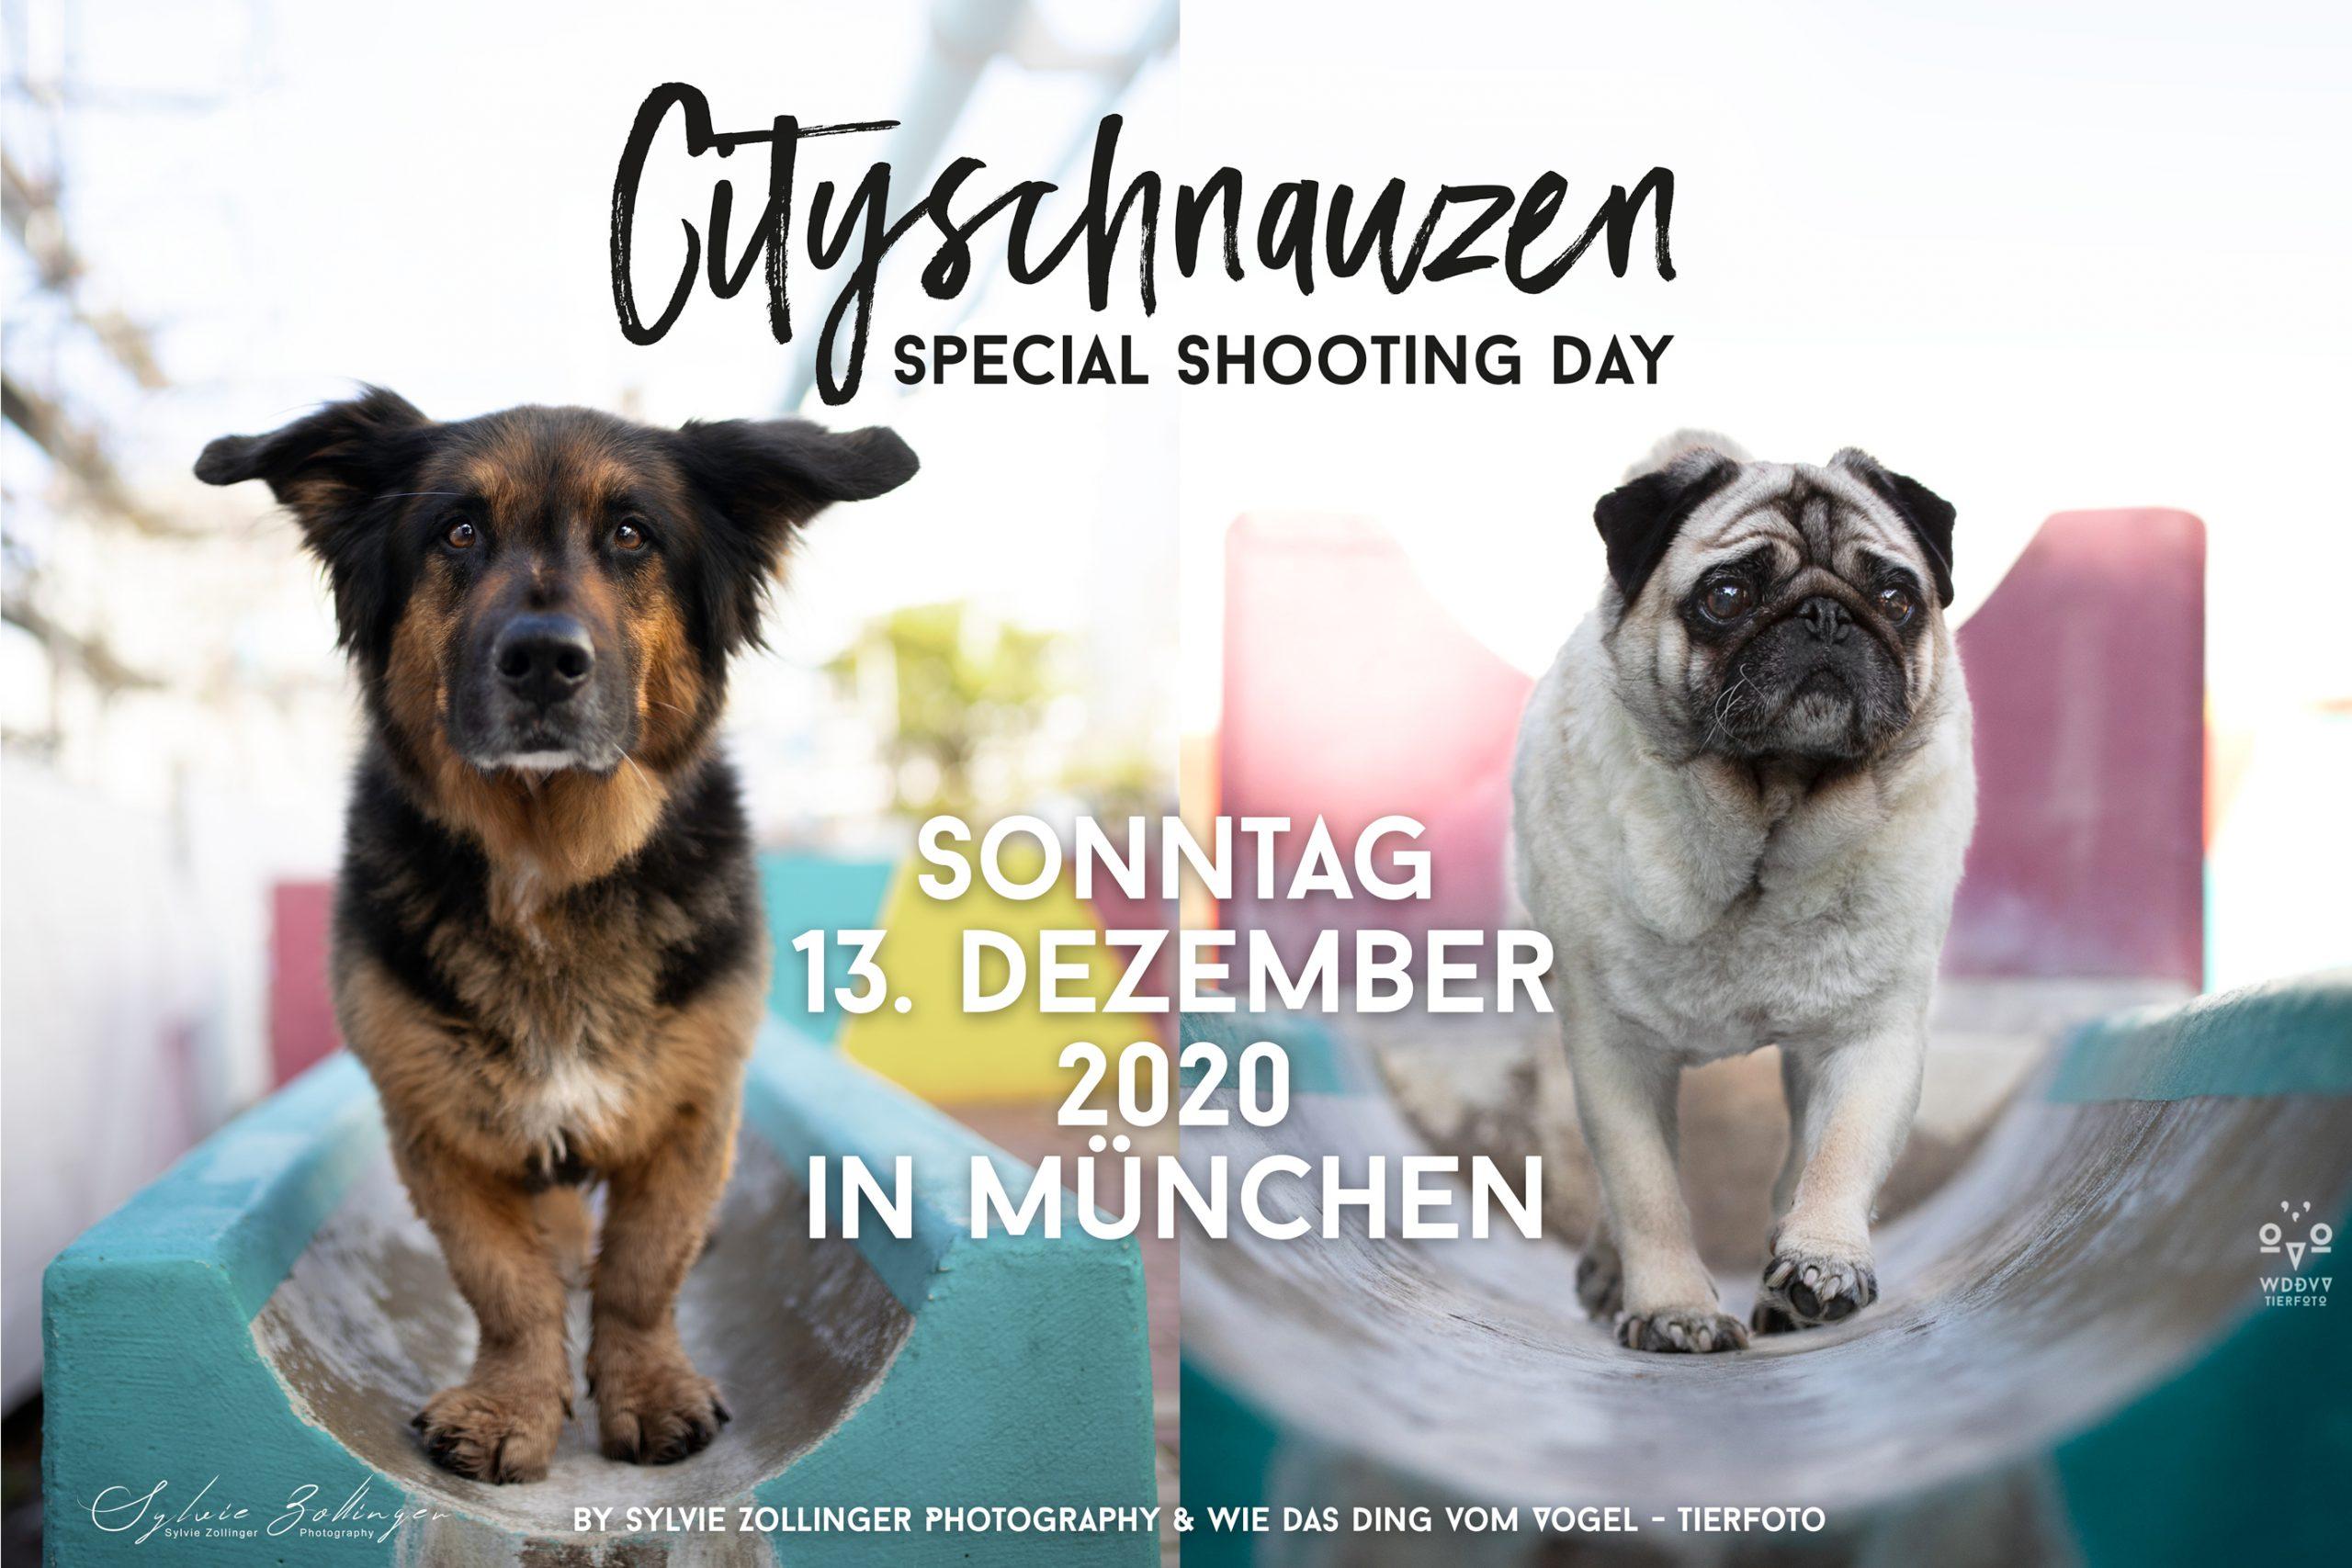 201123_Header_Cityschnauzen_03